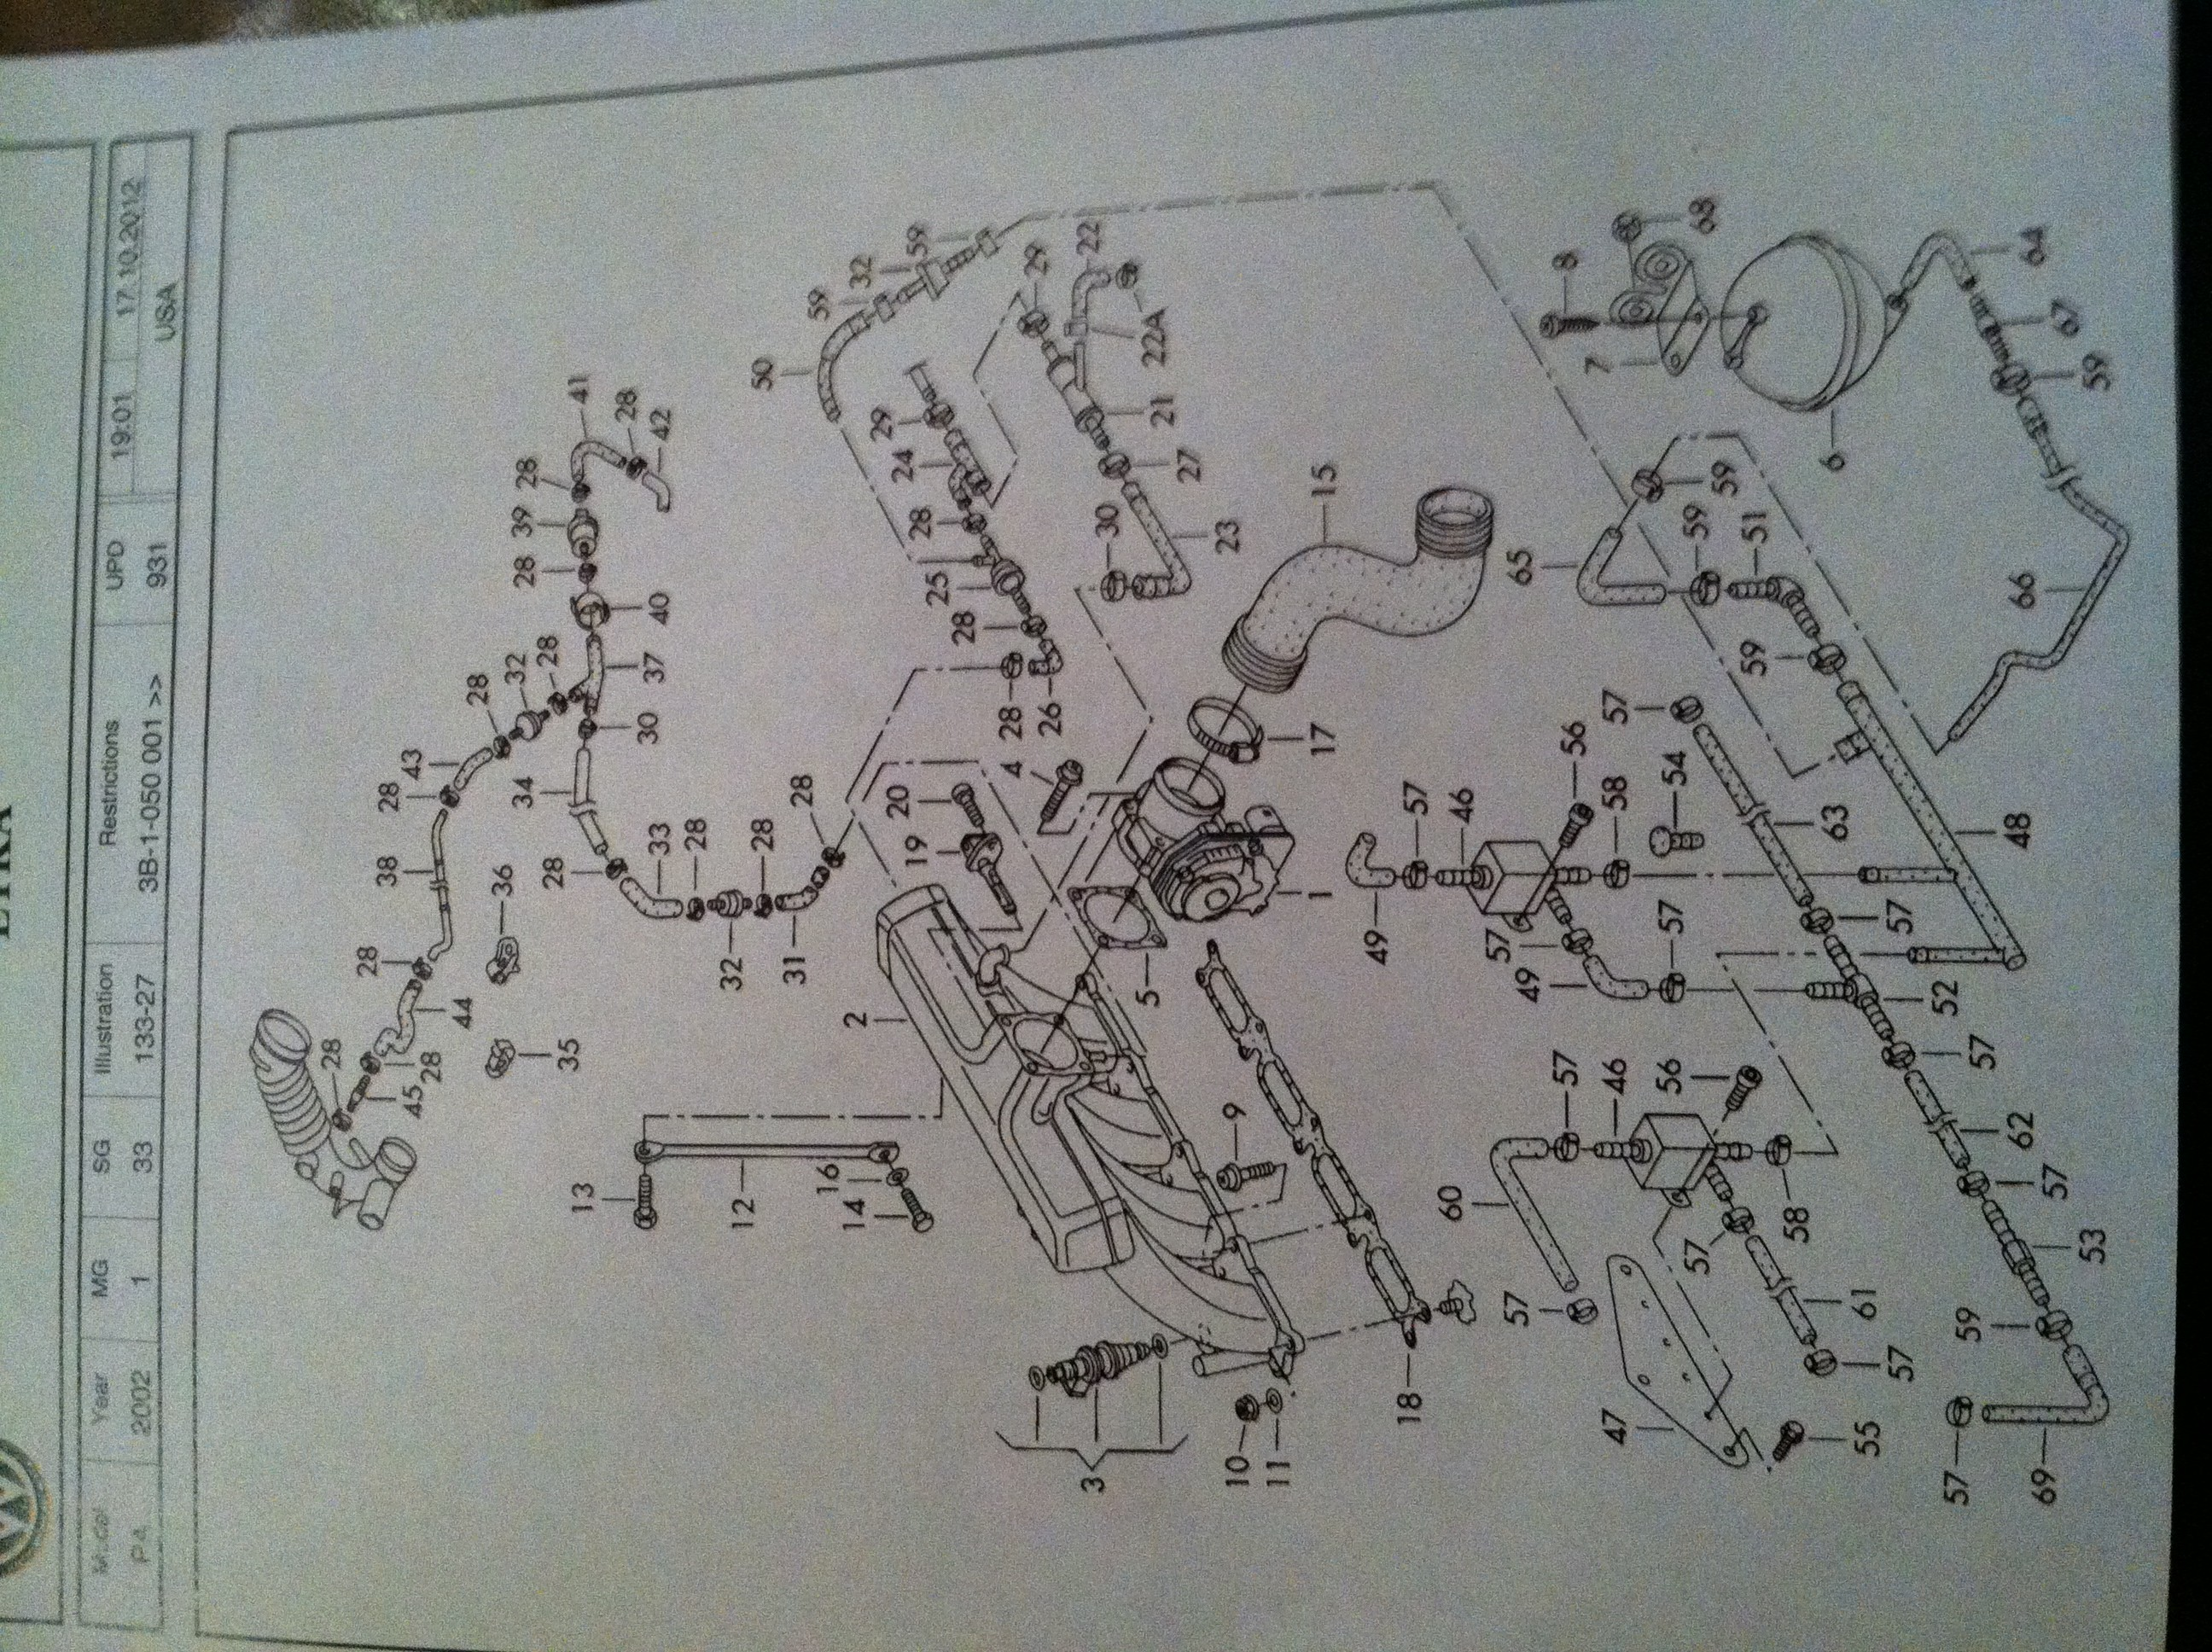 Vw 1 8 T Engine Diagram 2 A 2002 Passat 1 8t where Does the Vacuum Hose Go Both Ends Of Vw 1 8 T Engine Diagram 2